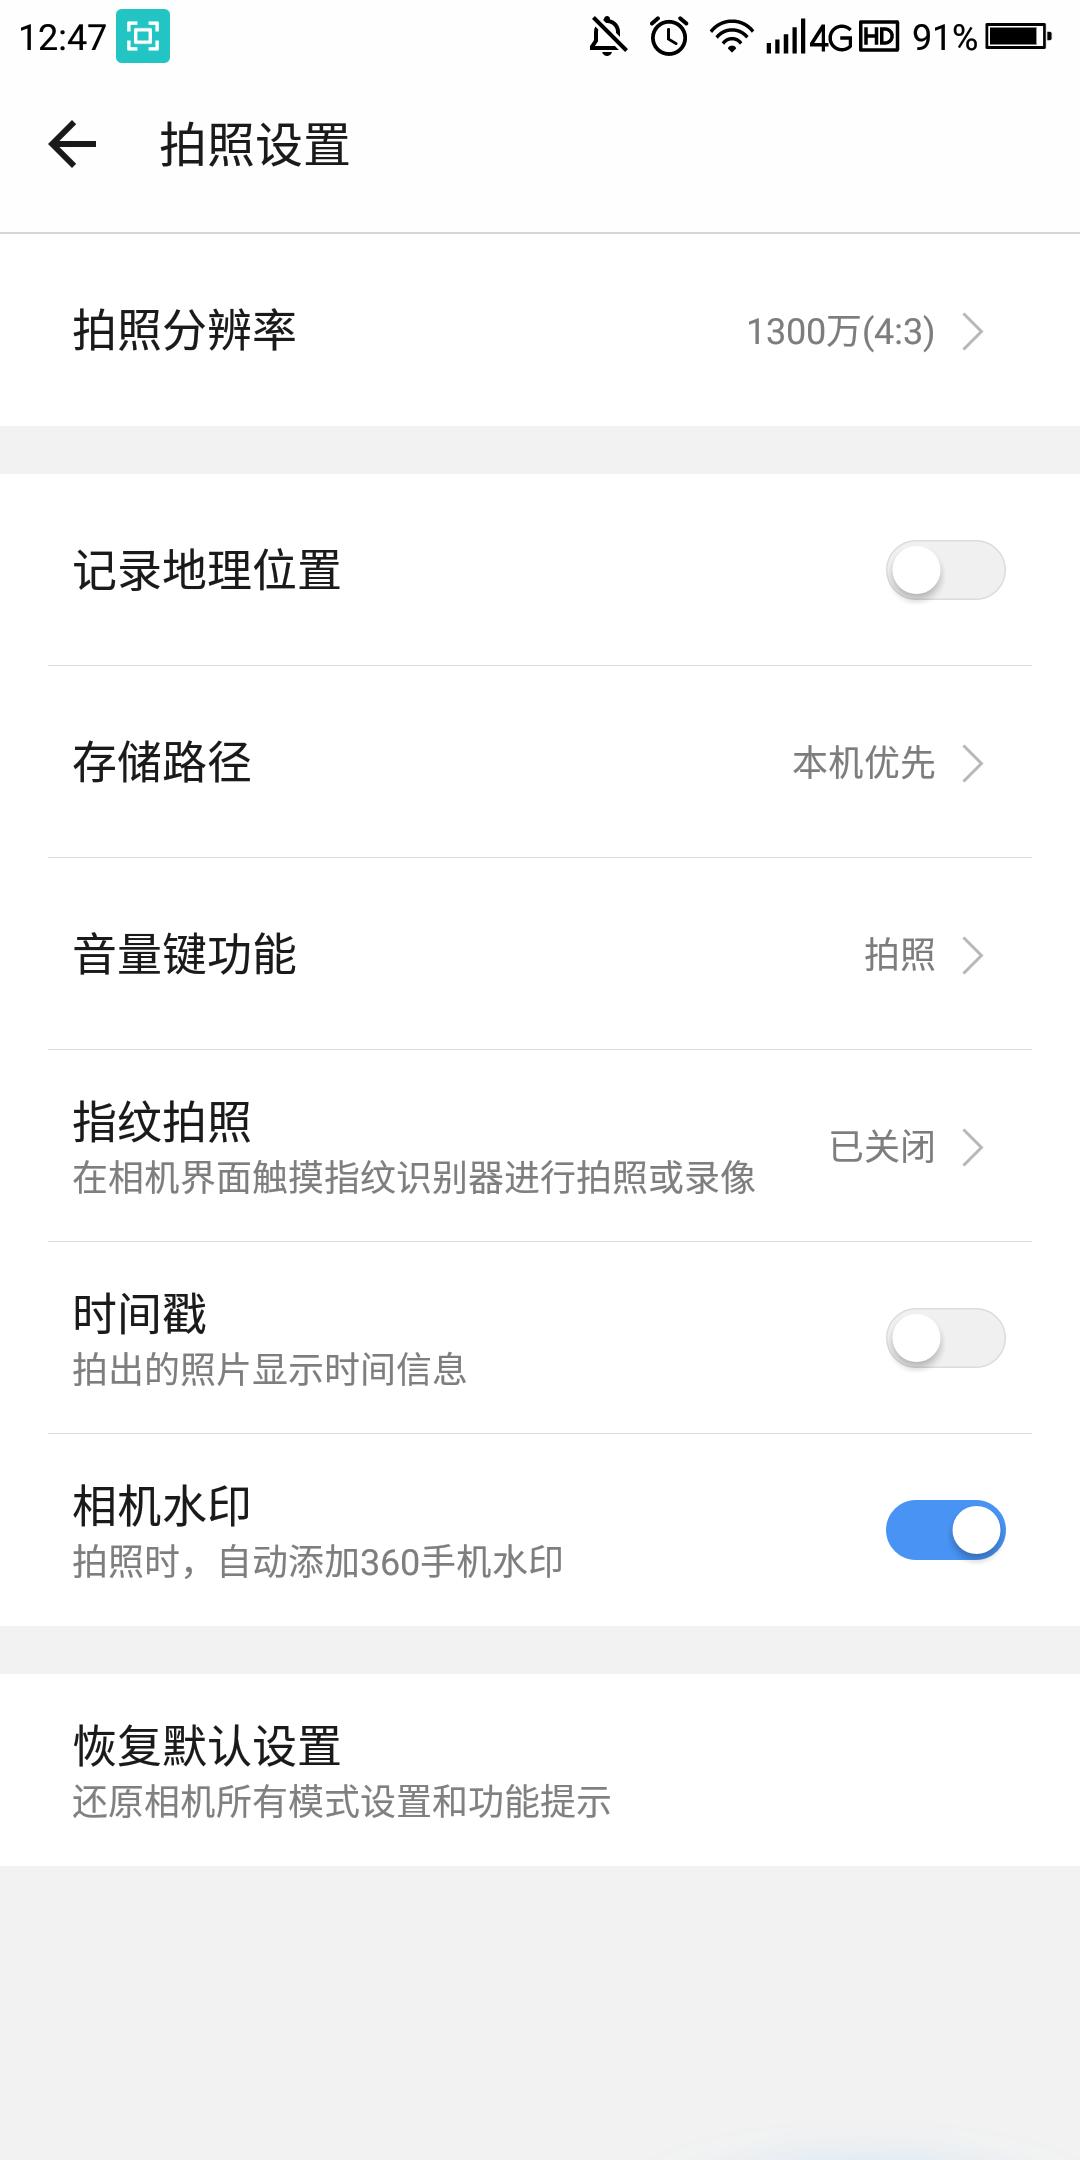 Screenshot_2019-04-01-12-47-27.png